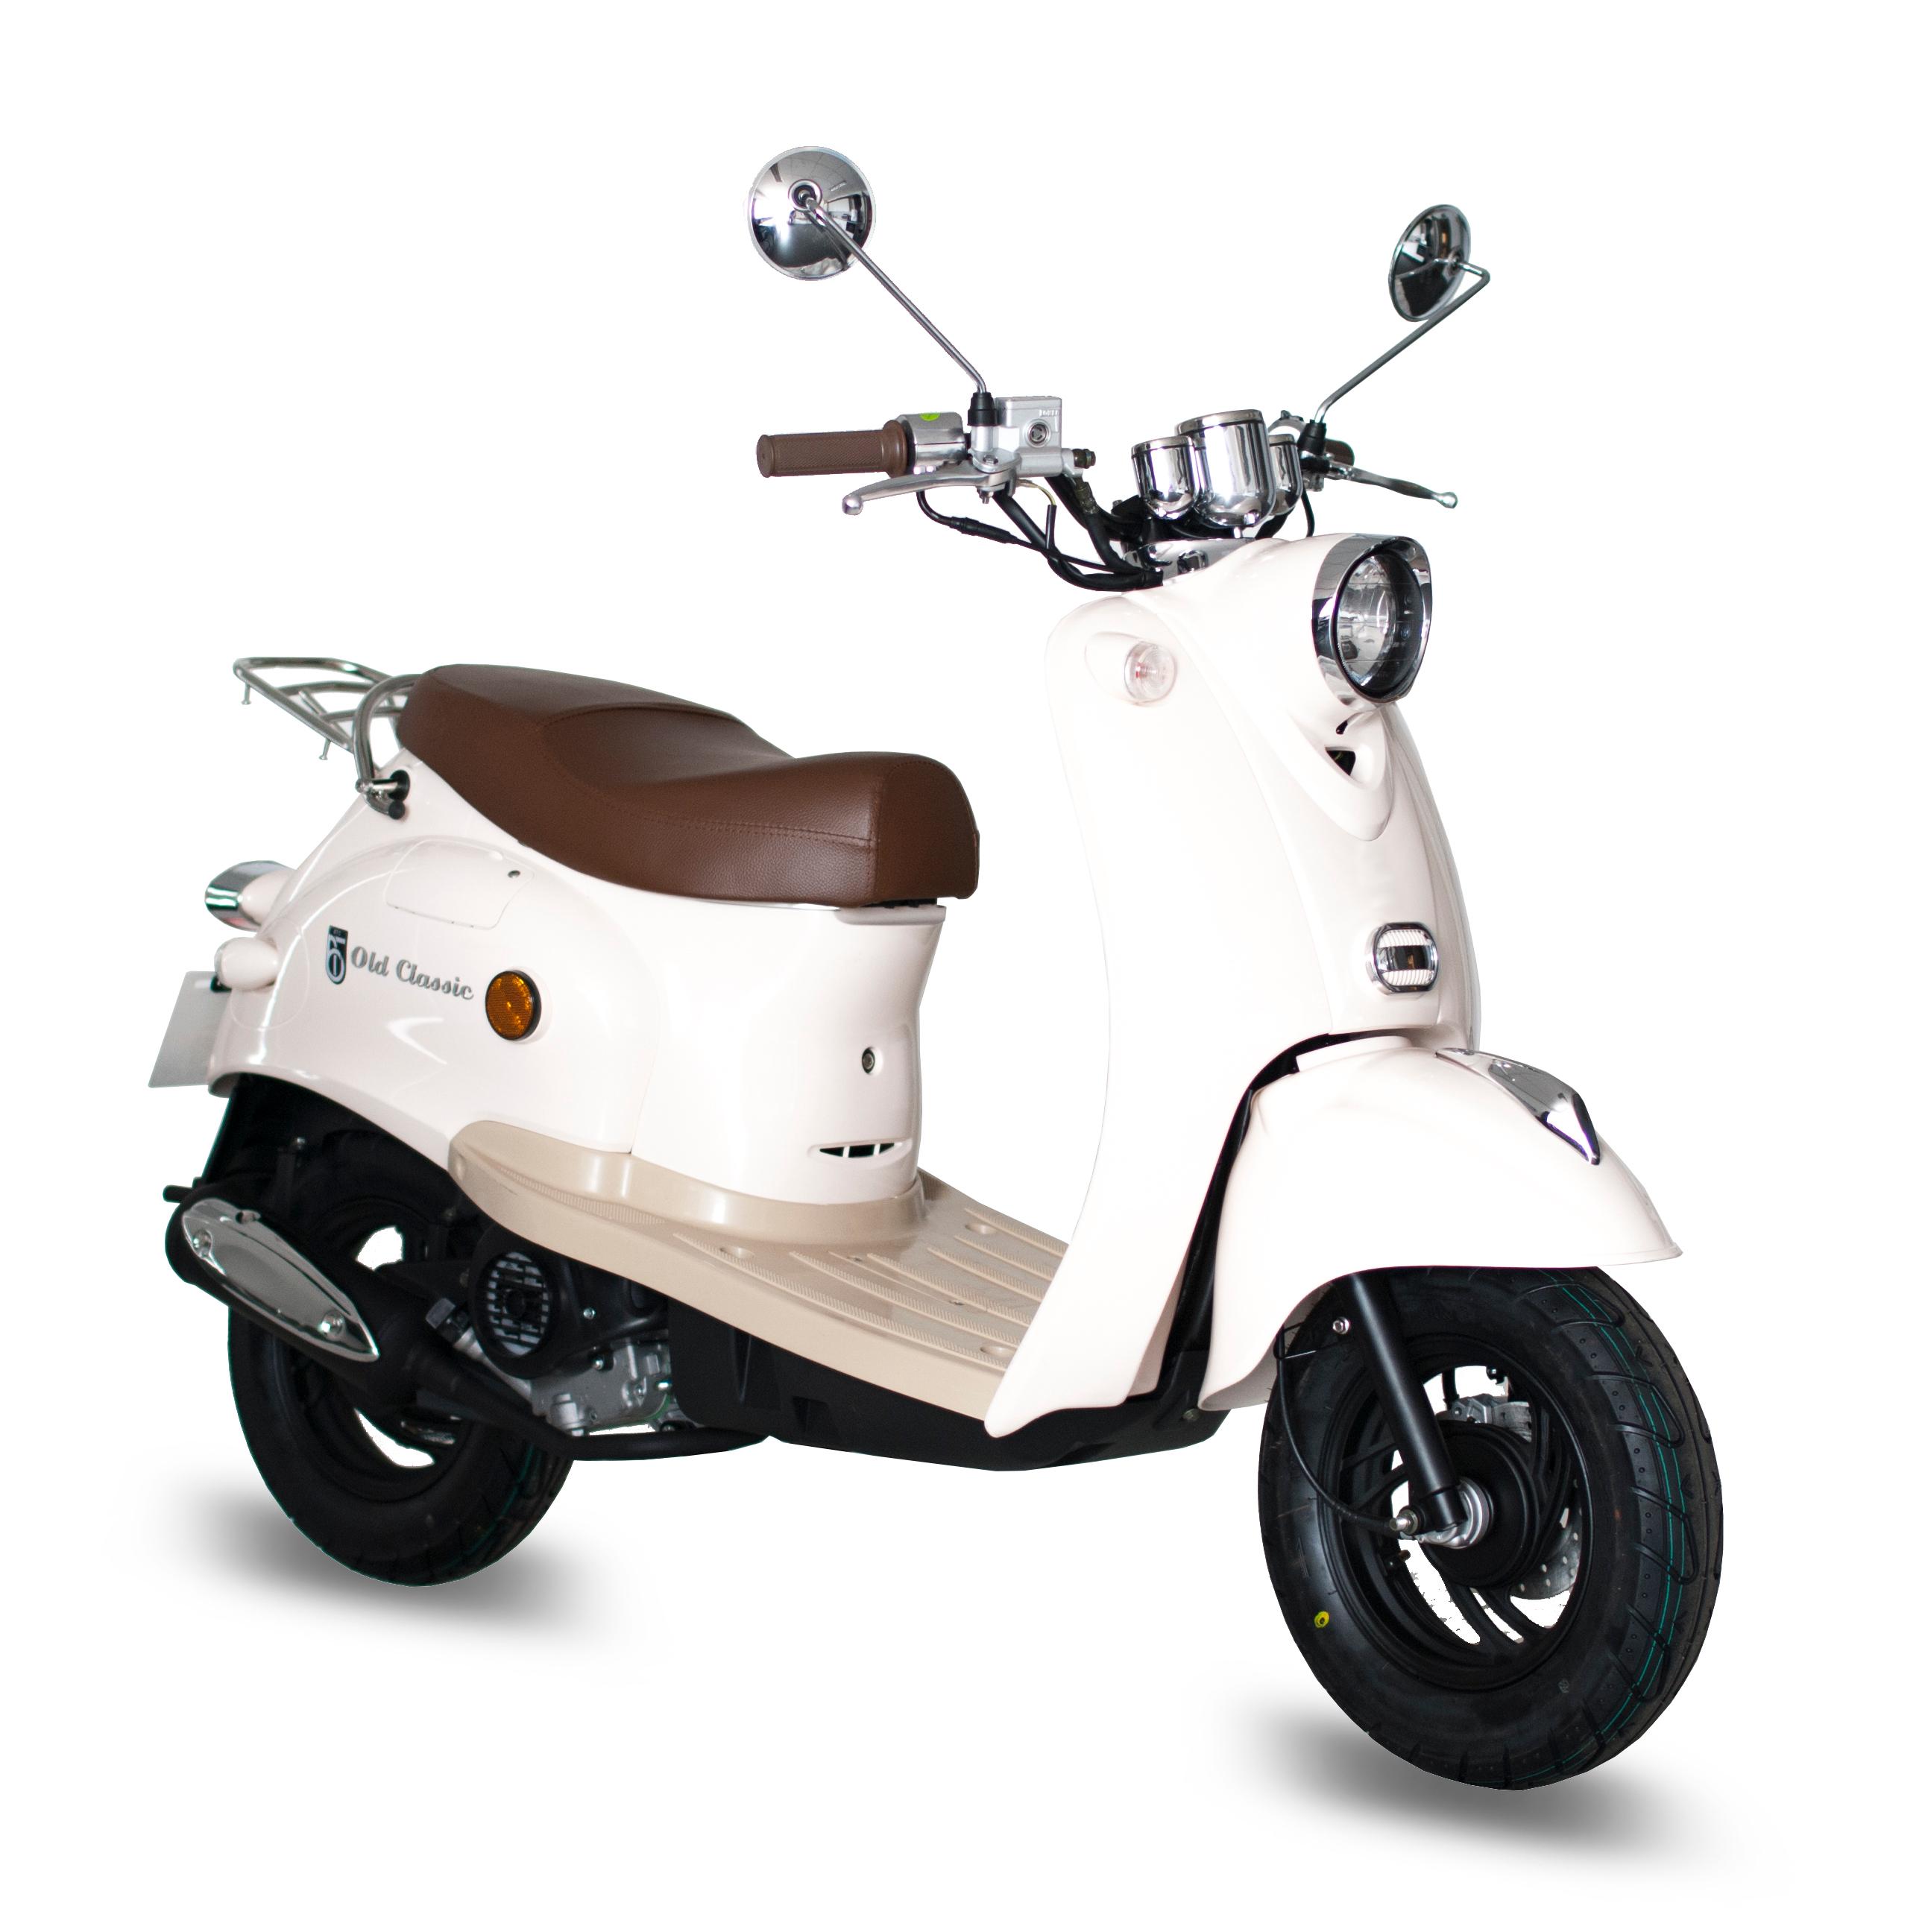 GMX 460 Retro Classic Motorroller 45 km/h cremeweiß Euro 4